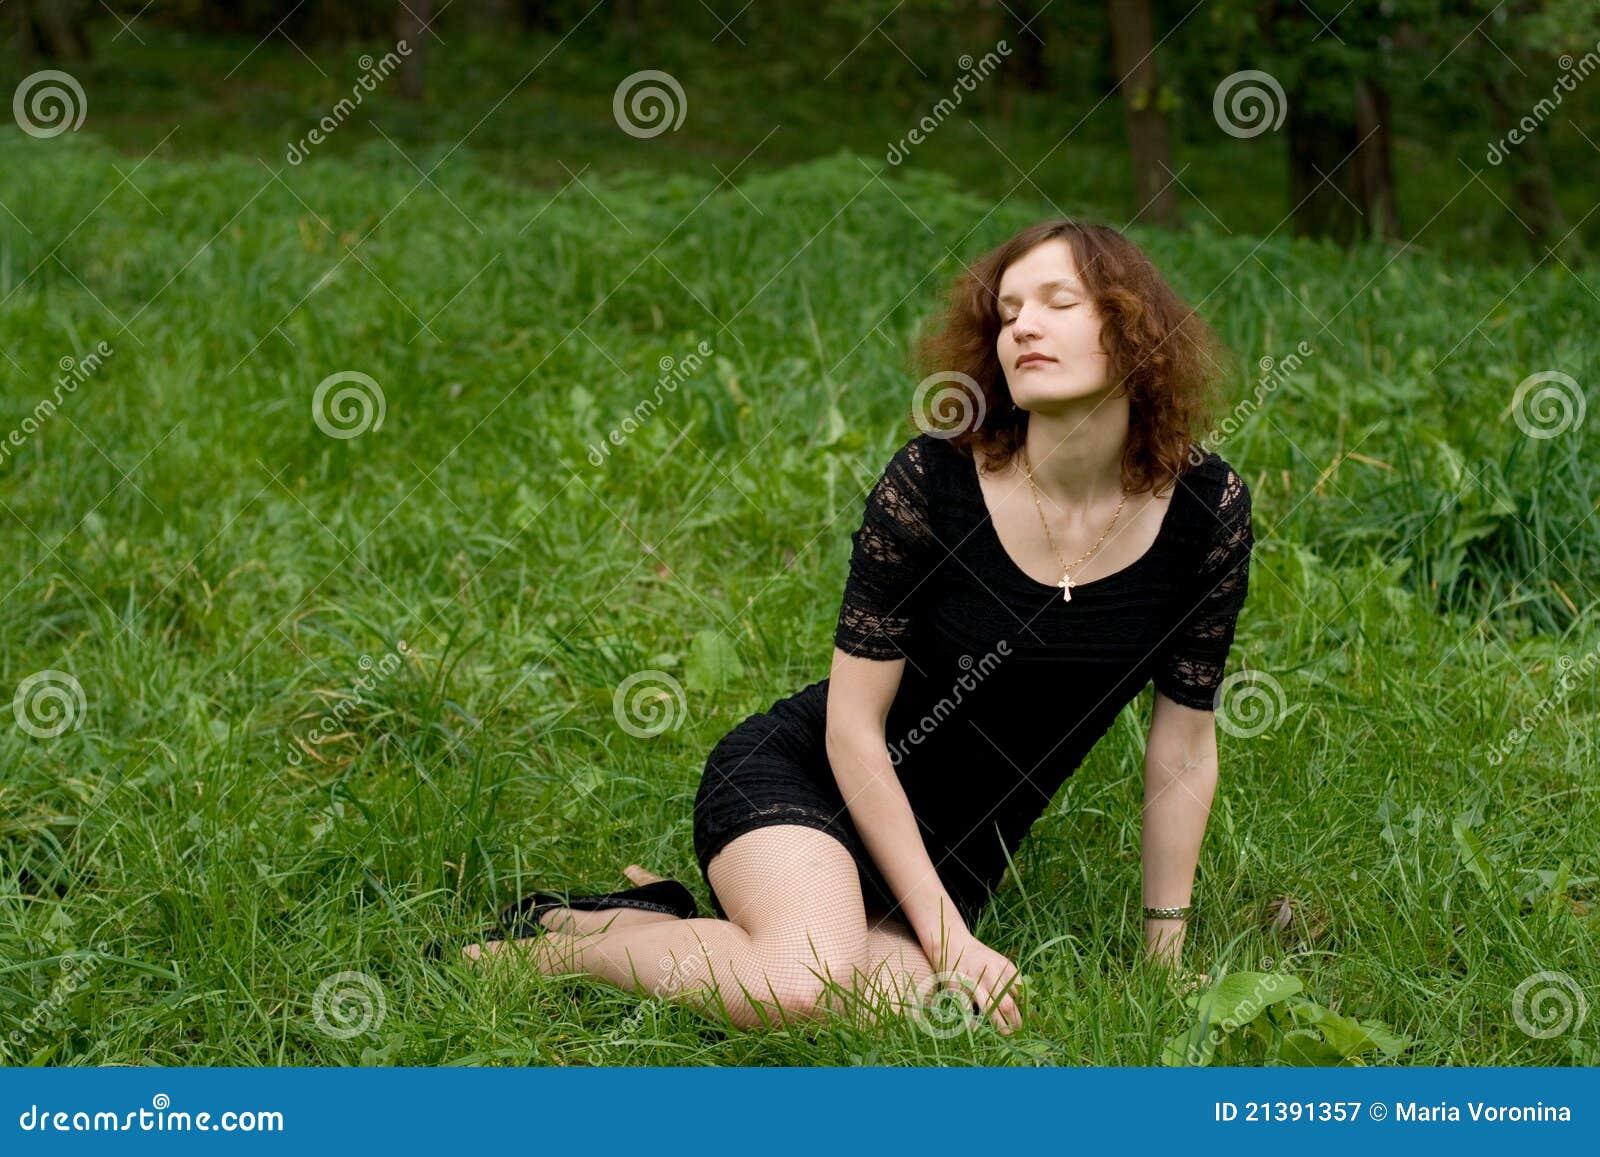 girl sitting on grass